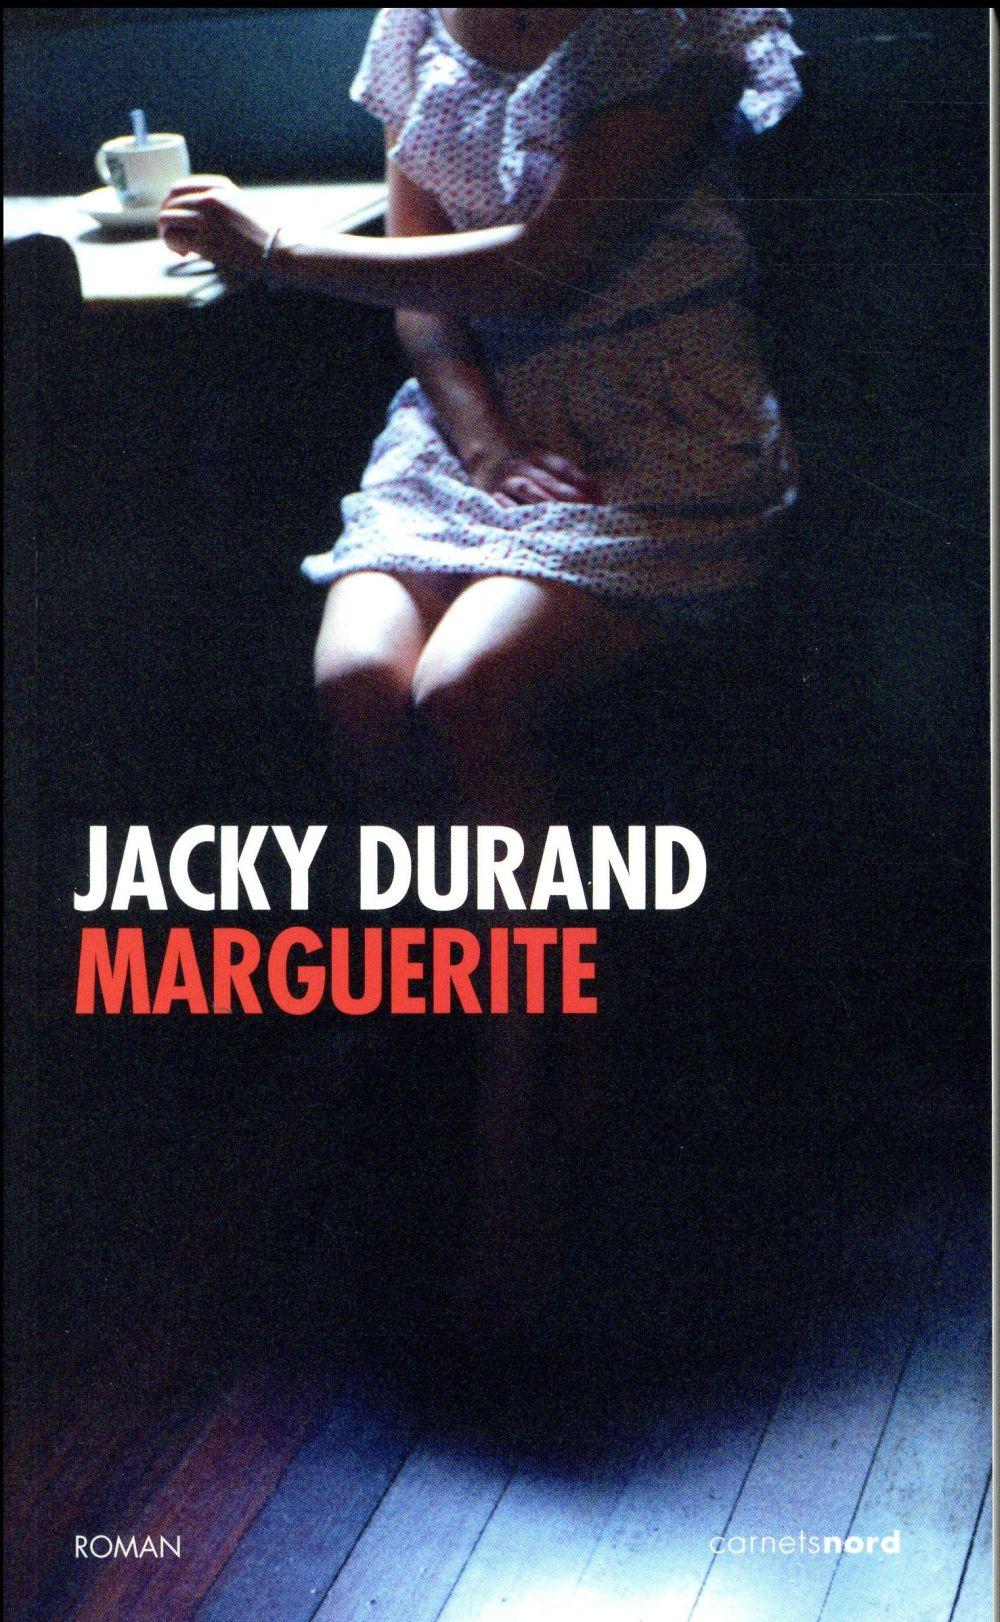 Durand Jacky - Marguerite